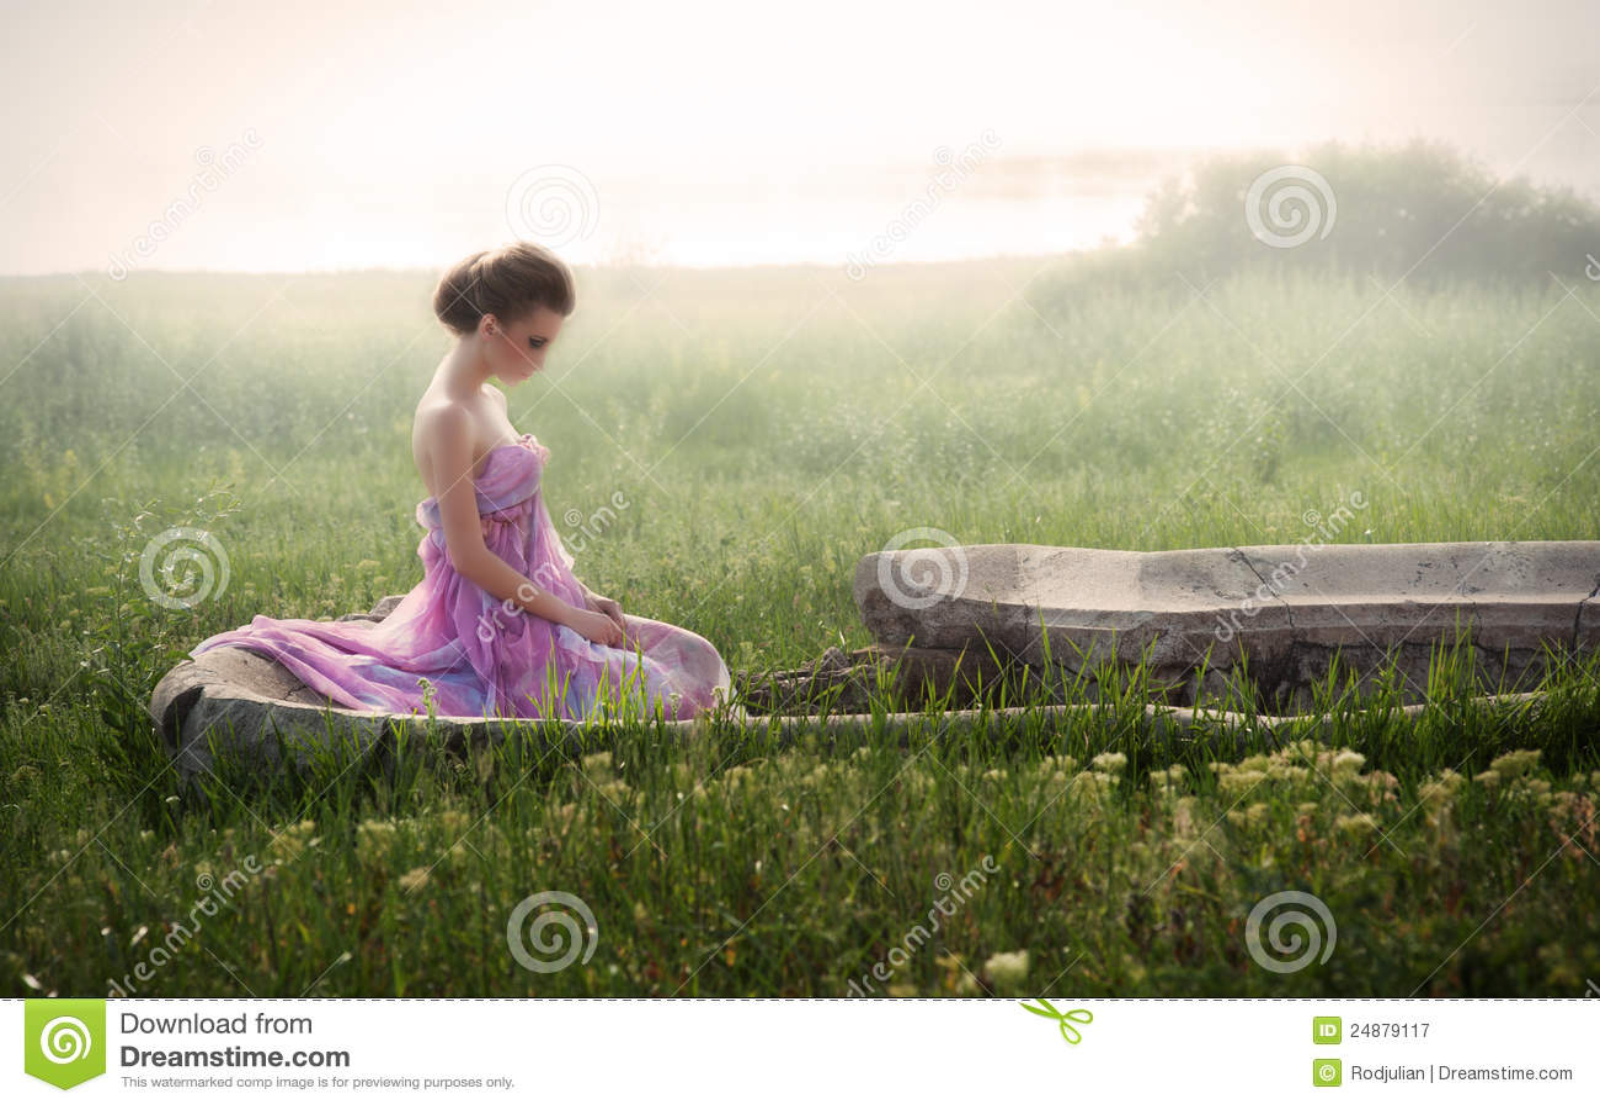 Romantic portrait of woman in ruins